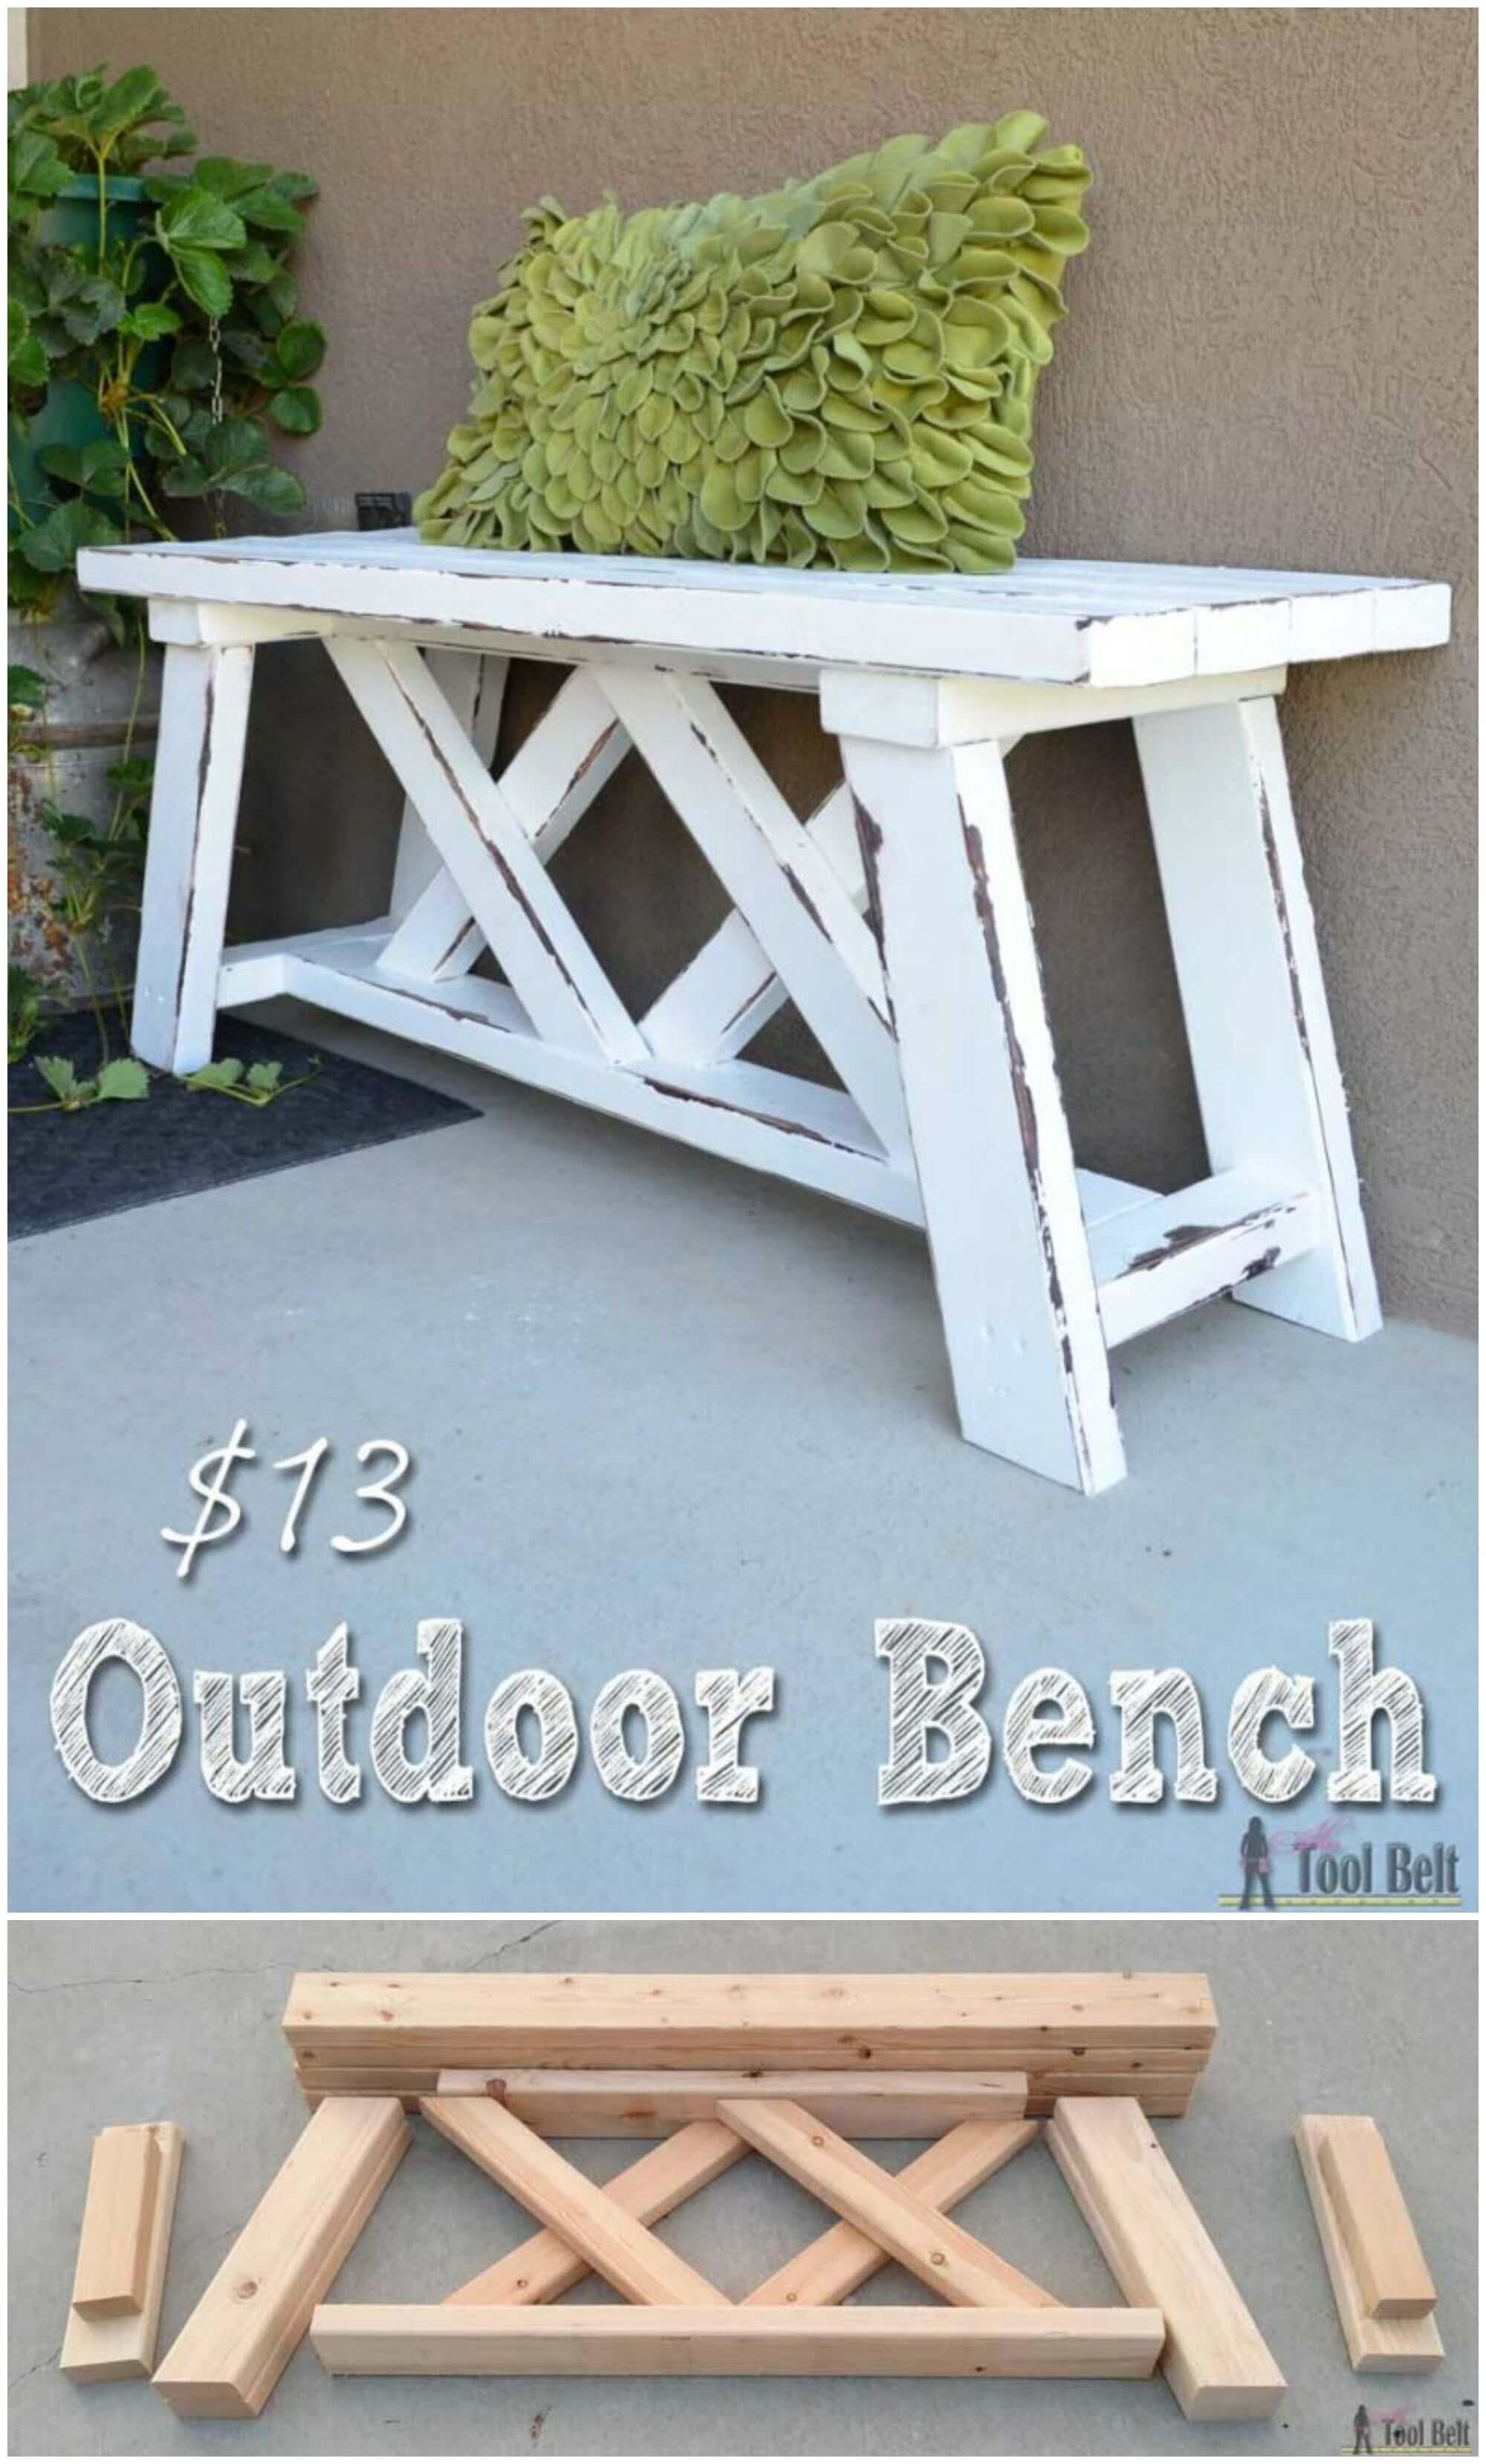 Build an Outdoor Bench